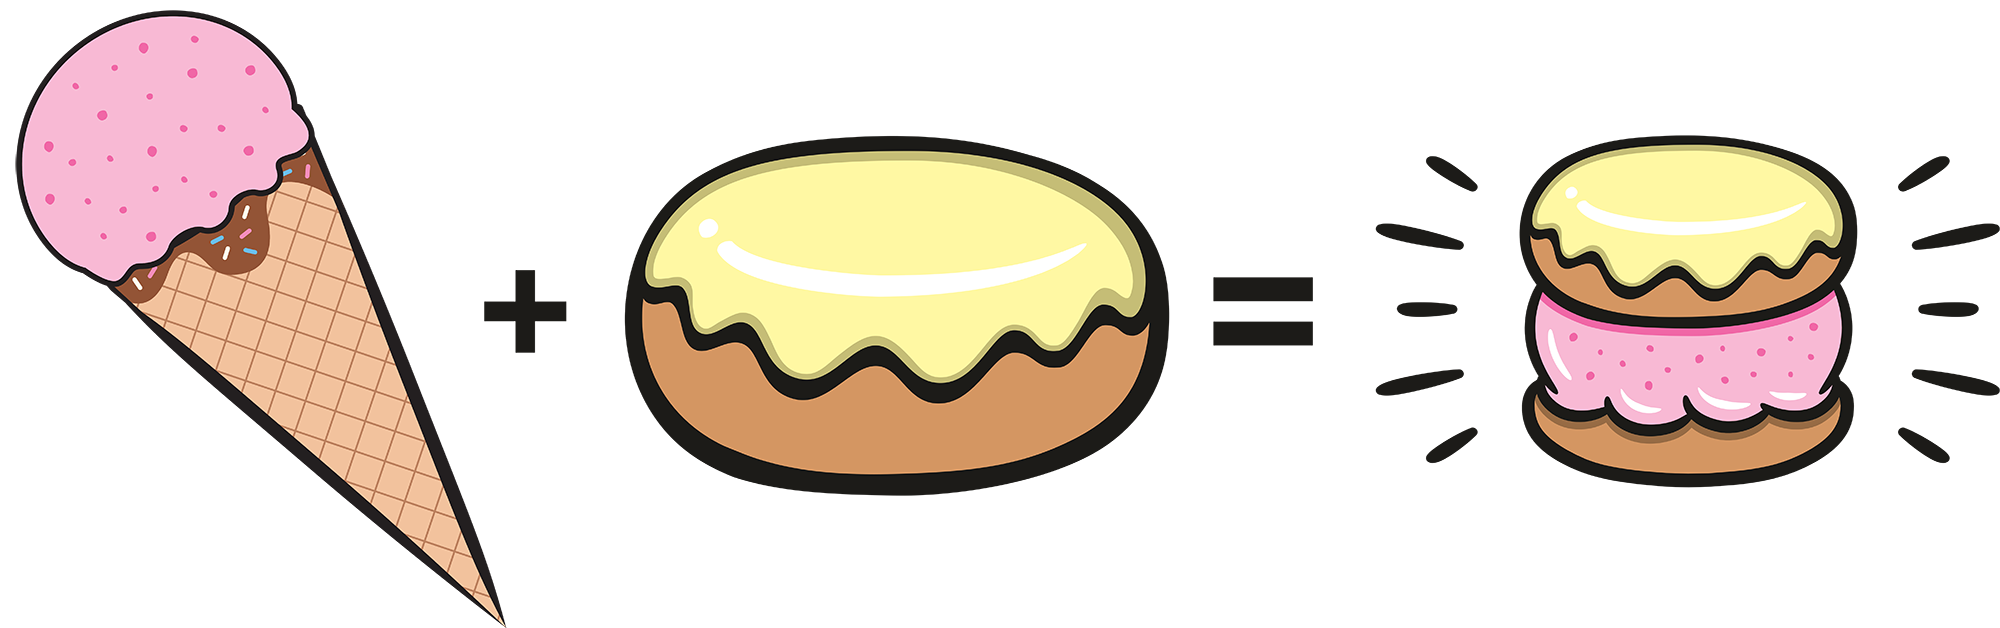 Stuffed Ice Cream Scoops Glaze Donut Cruff